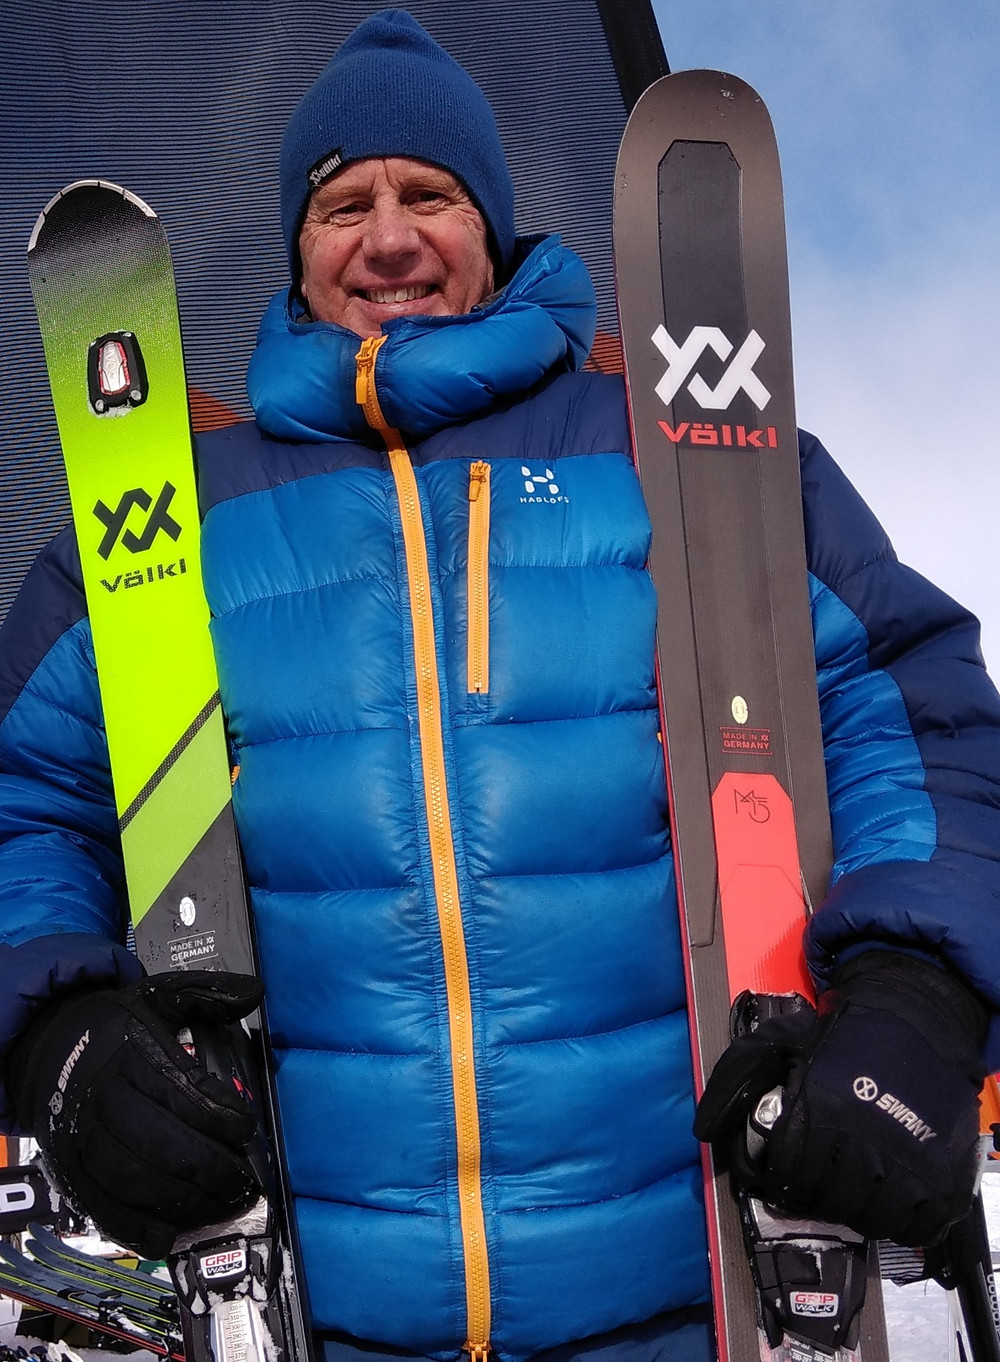 geoffmckeown holding volkl skiis